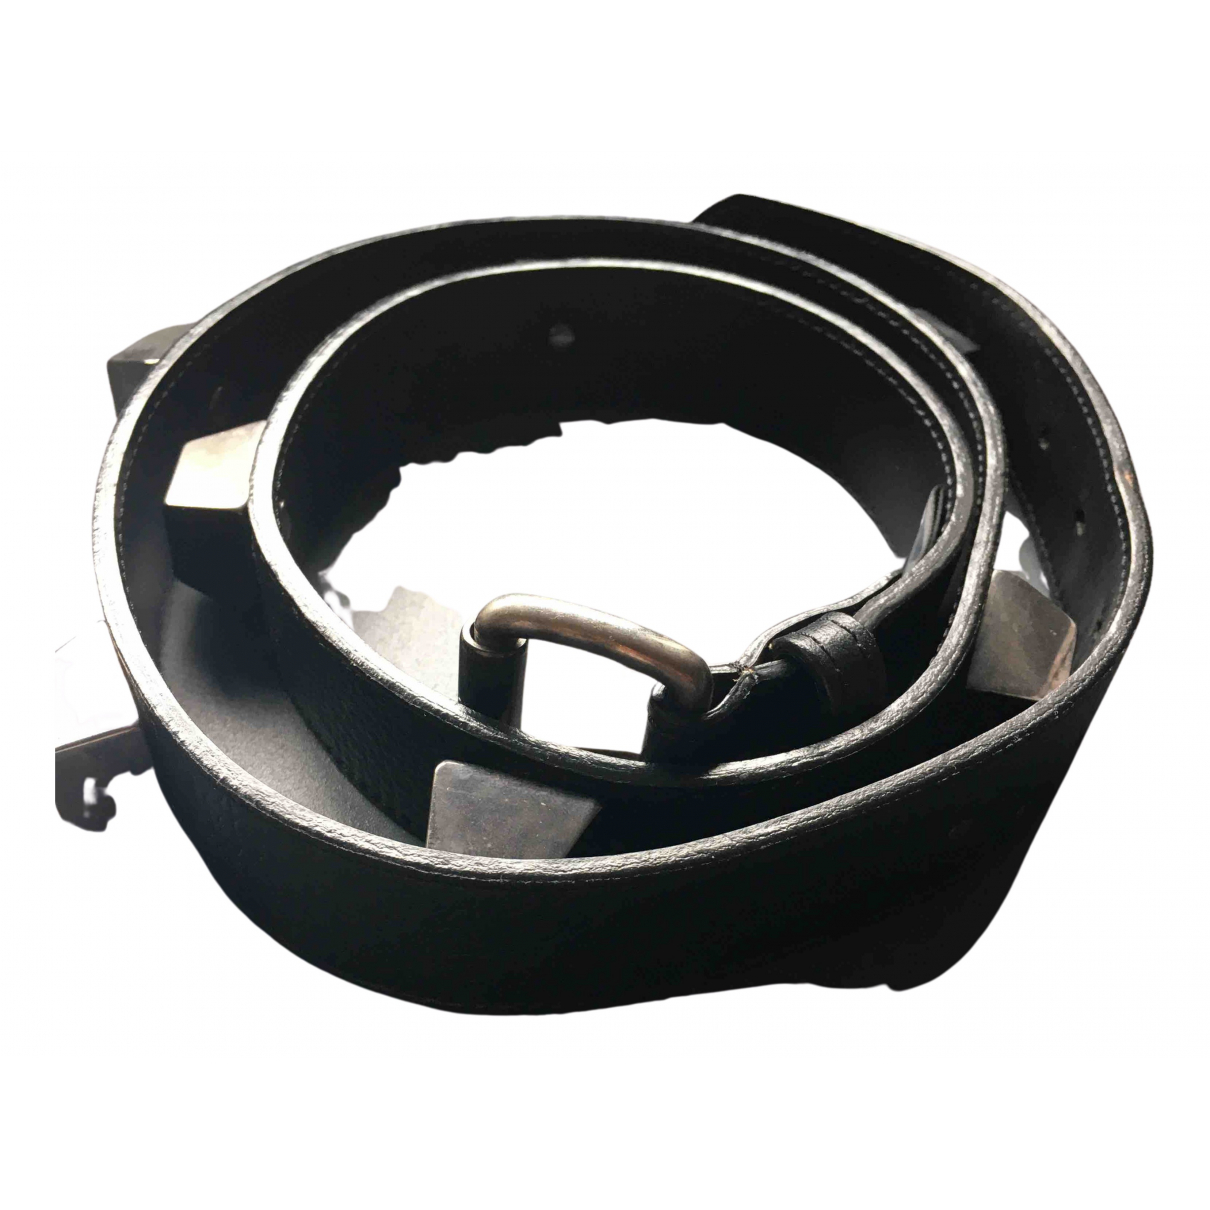 Cnc N Black Leather belt for Women S International